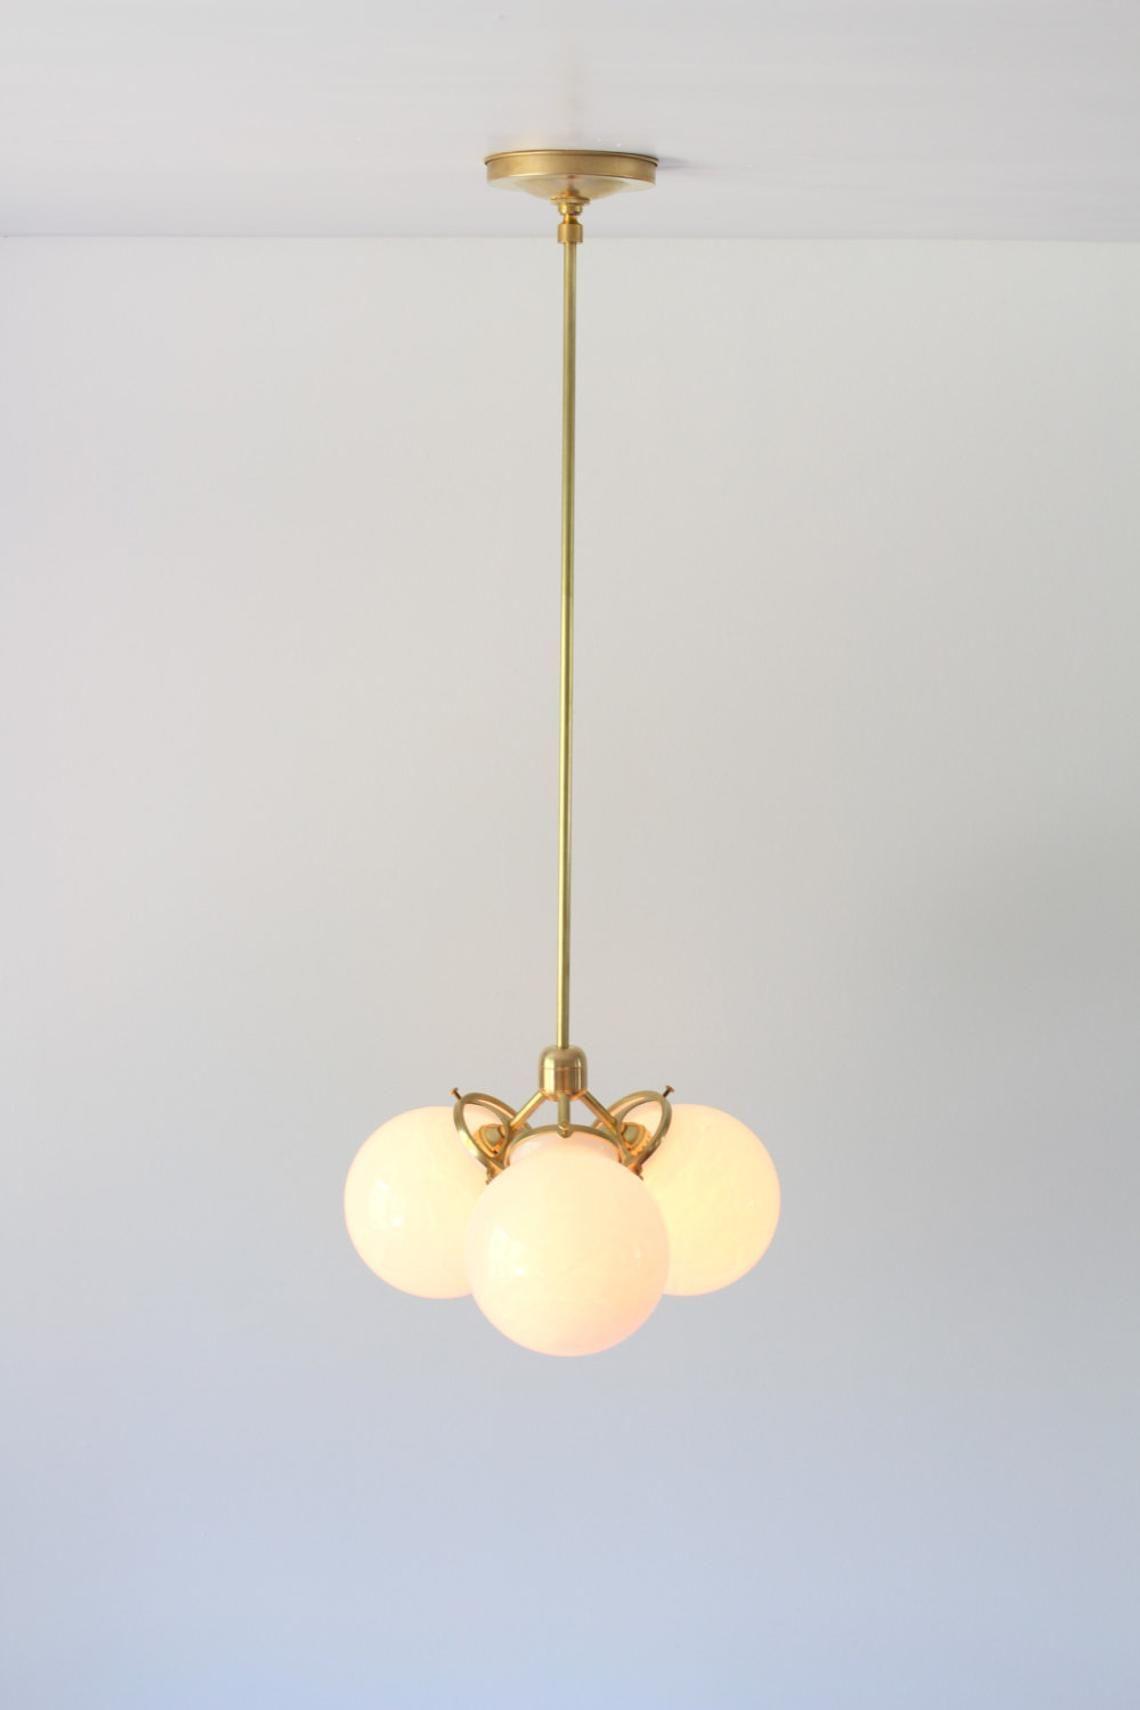 Br Chandelier Pendant Light Modern Hanging